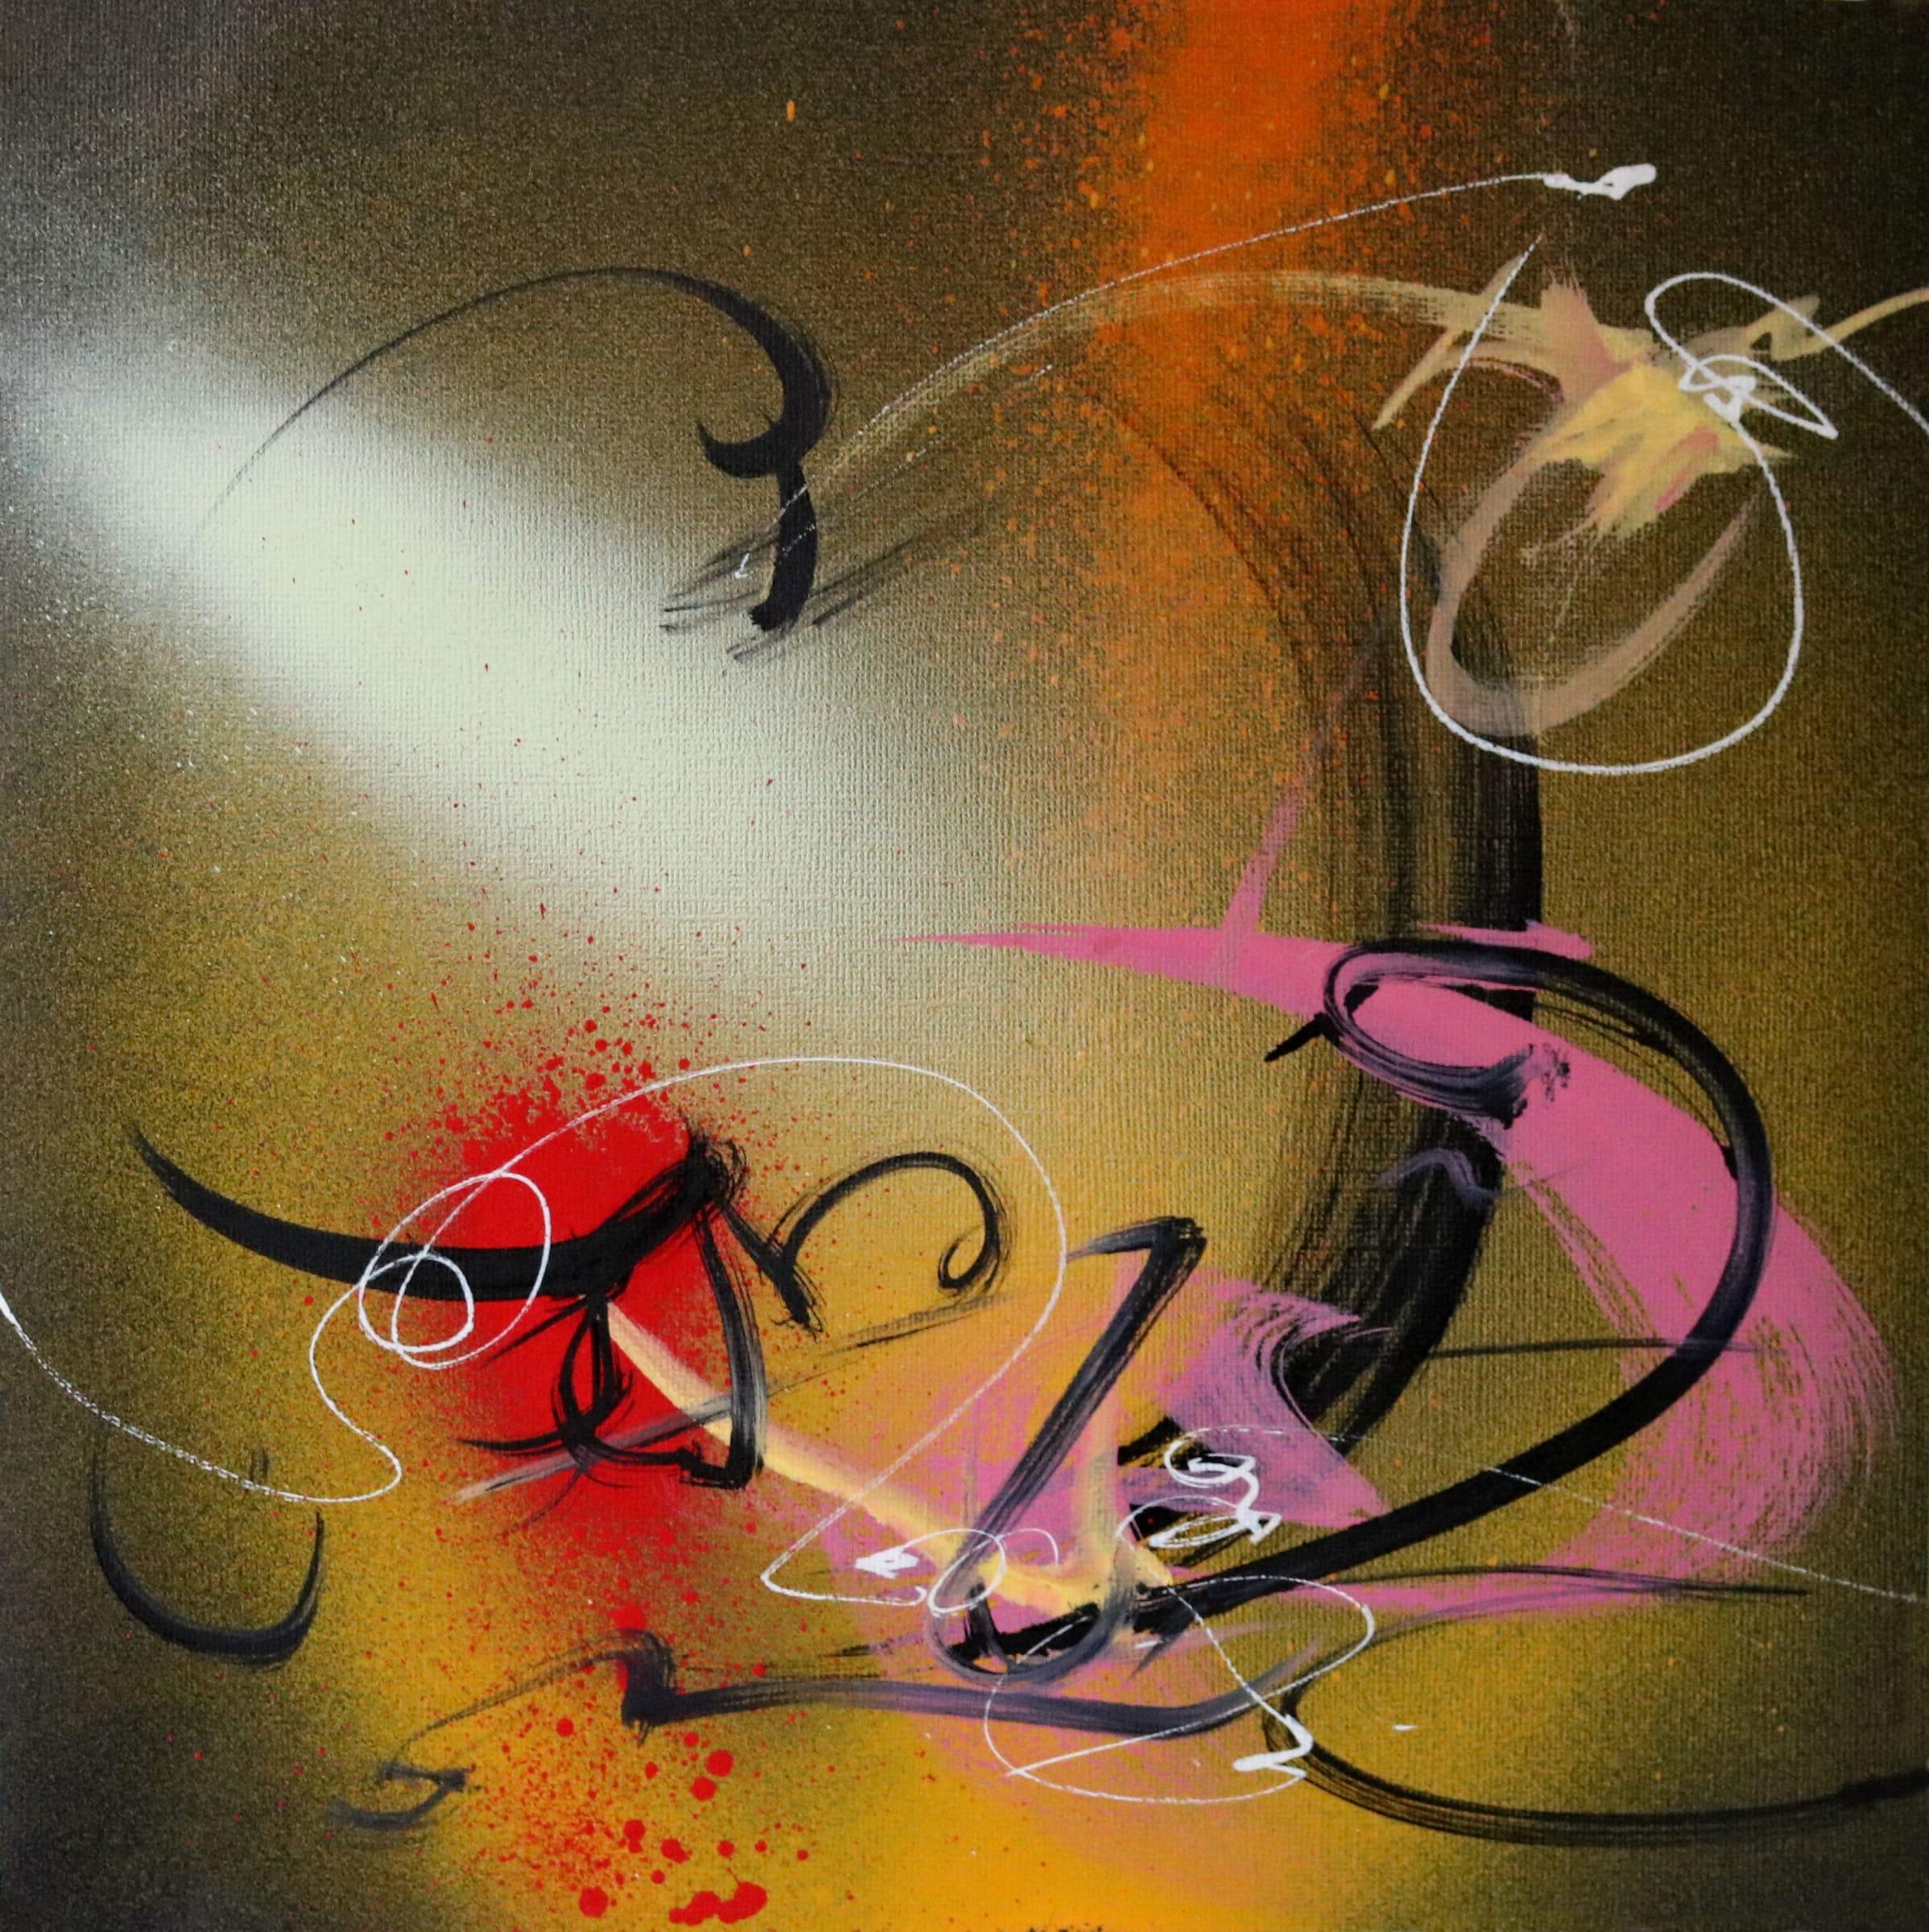 "<span class=""link fancybox-details-link""><a href=""/artists/216-simon-williams/works/7415-simon-williams-khufu-dreams-2018/"">View Detail Page</a></span><div class=""artist""><strong>Simon Williams</strong></div> b. 1961 <div class=""title""><em>Khufu Dreams</em>, 2018</div> <div class=""medium"">Spray paint and acrylic ink on coloured paper</div> <div class=""dimensions"">h. 30 cm x w. 30 cm</div><div class=""price"">£550.00</div><div class=""copyright_line"">£55 x 10 months, 0% APR</div>"